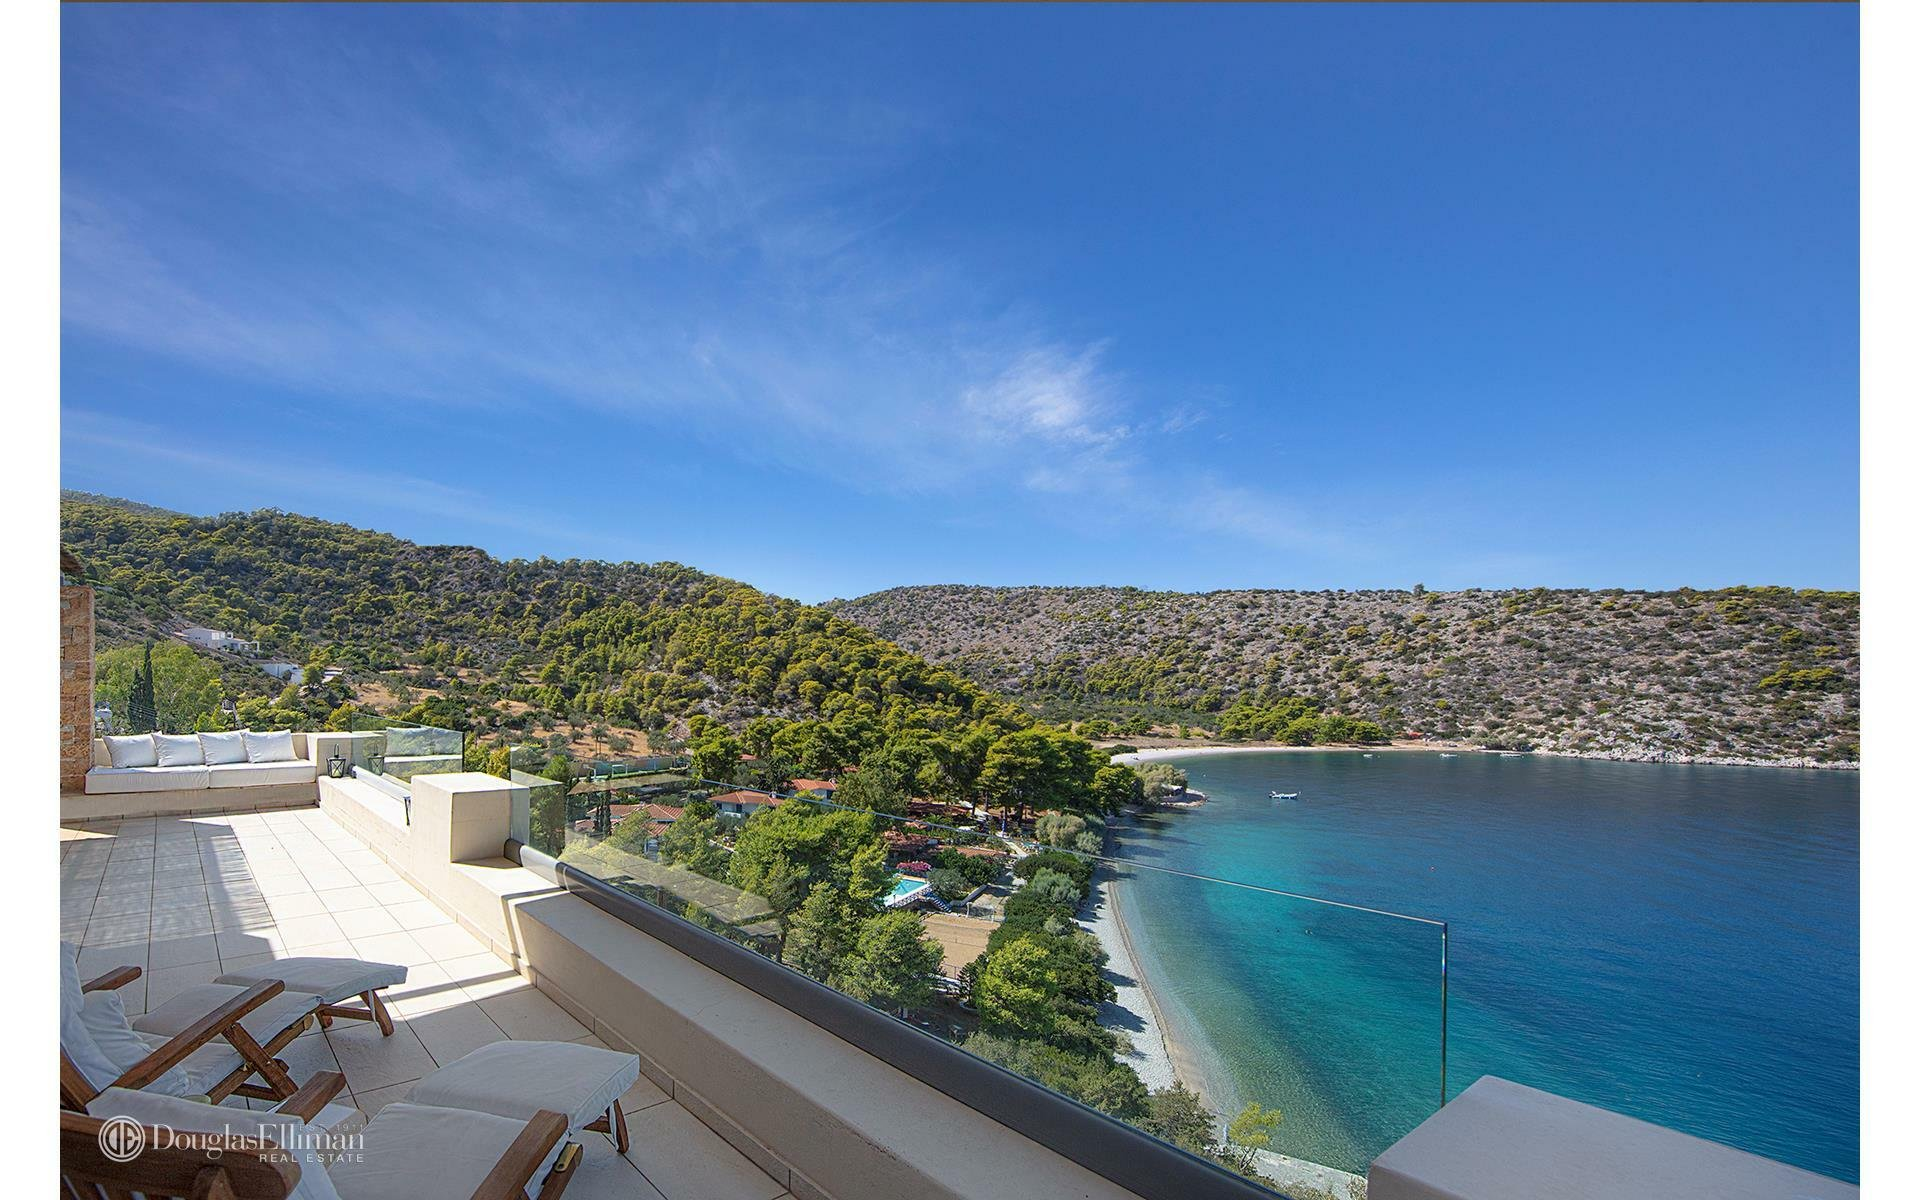 House in Sofiko, Greece 1